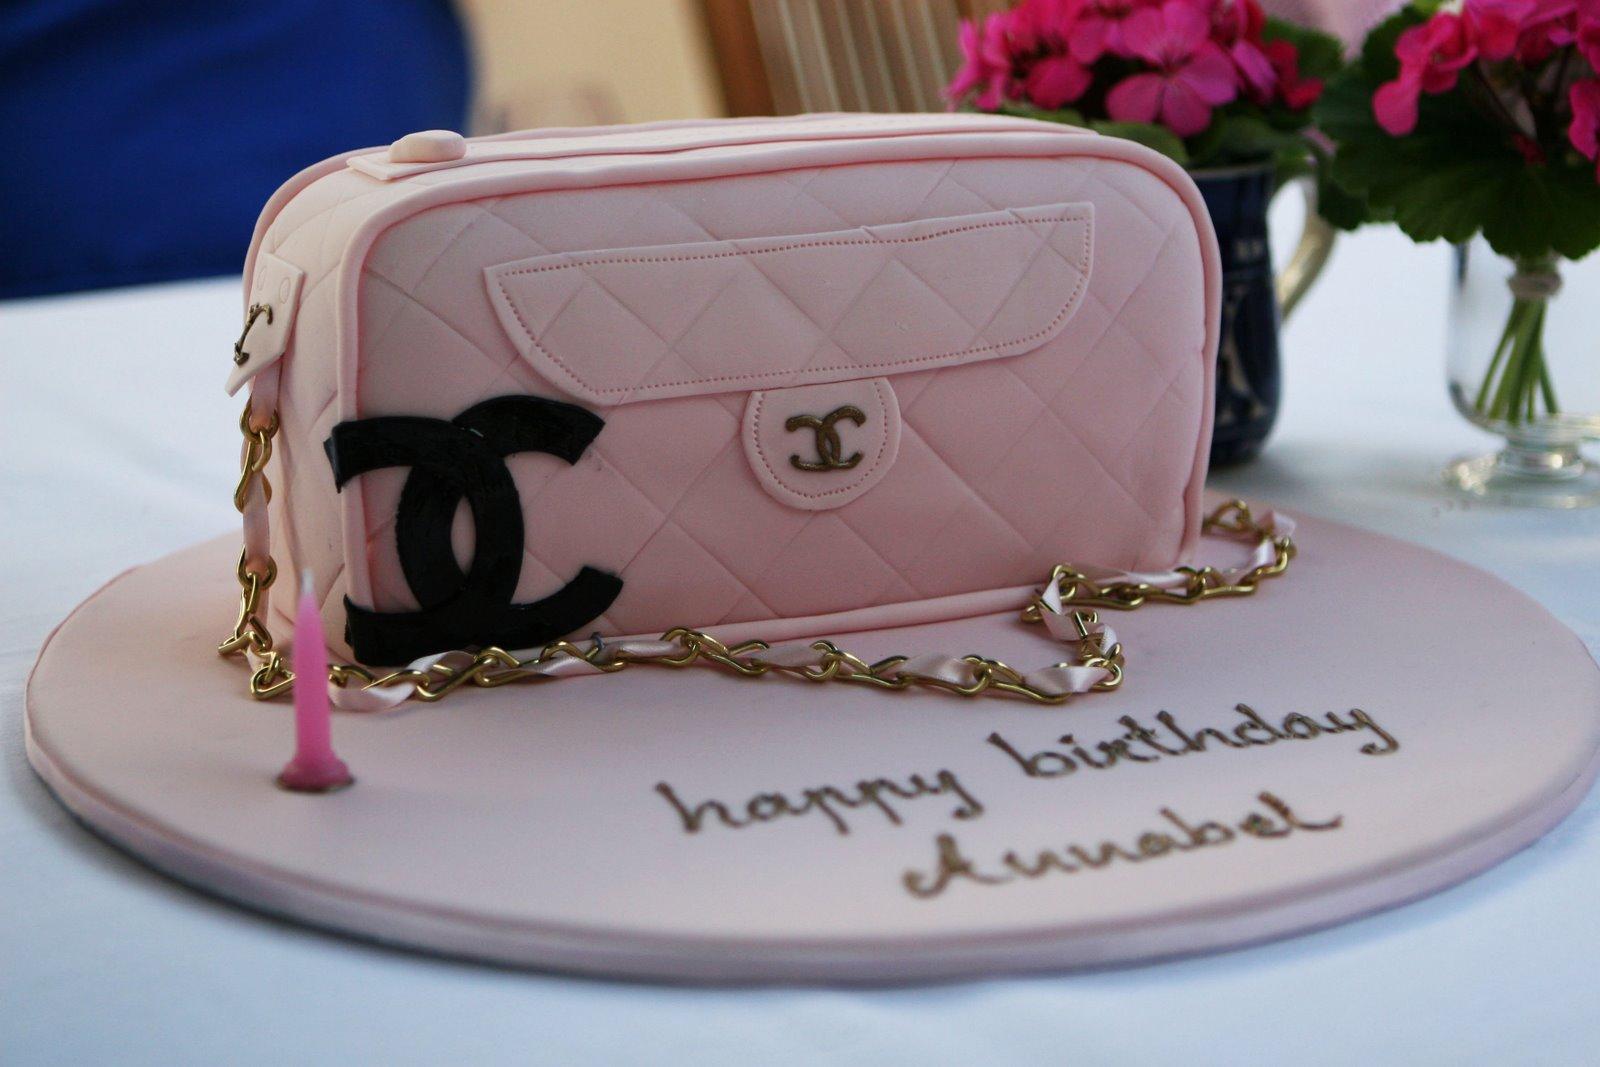 77bcfbcaf58a chanel designer handbag bag purse custom pastry cakes for birthdays  weddings graduation